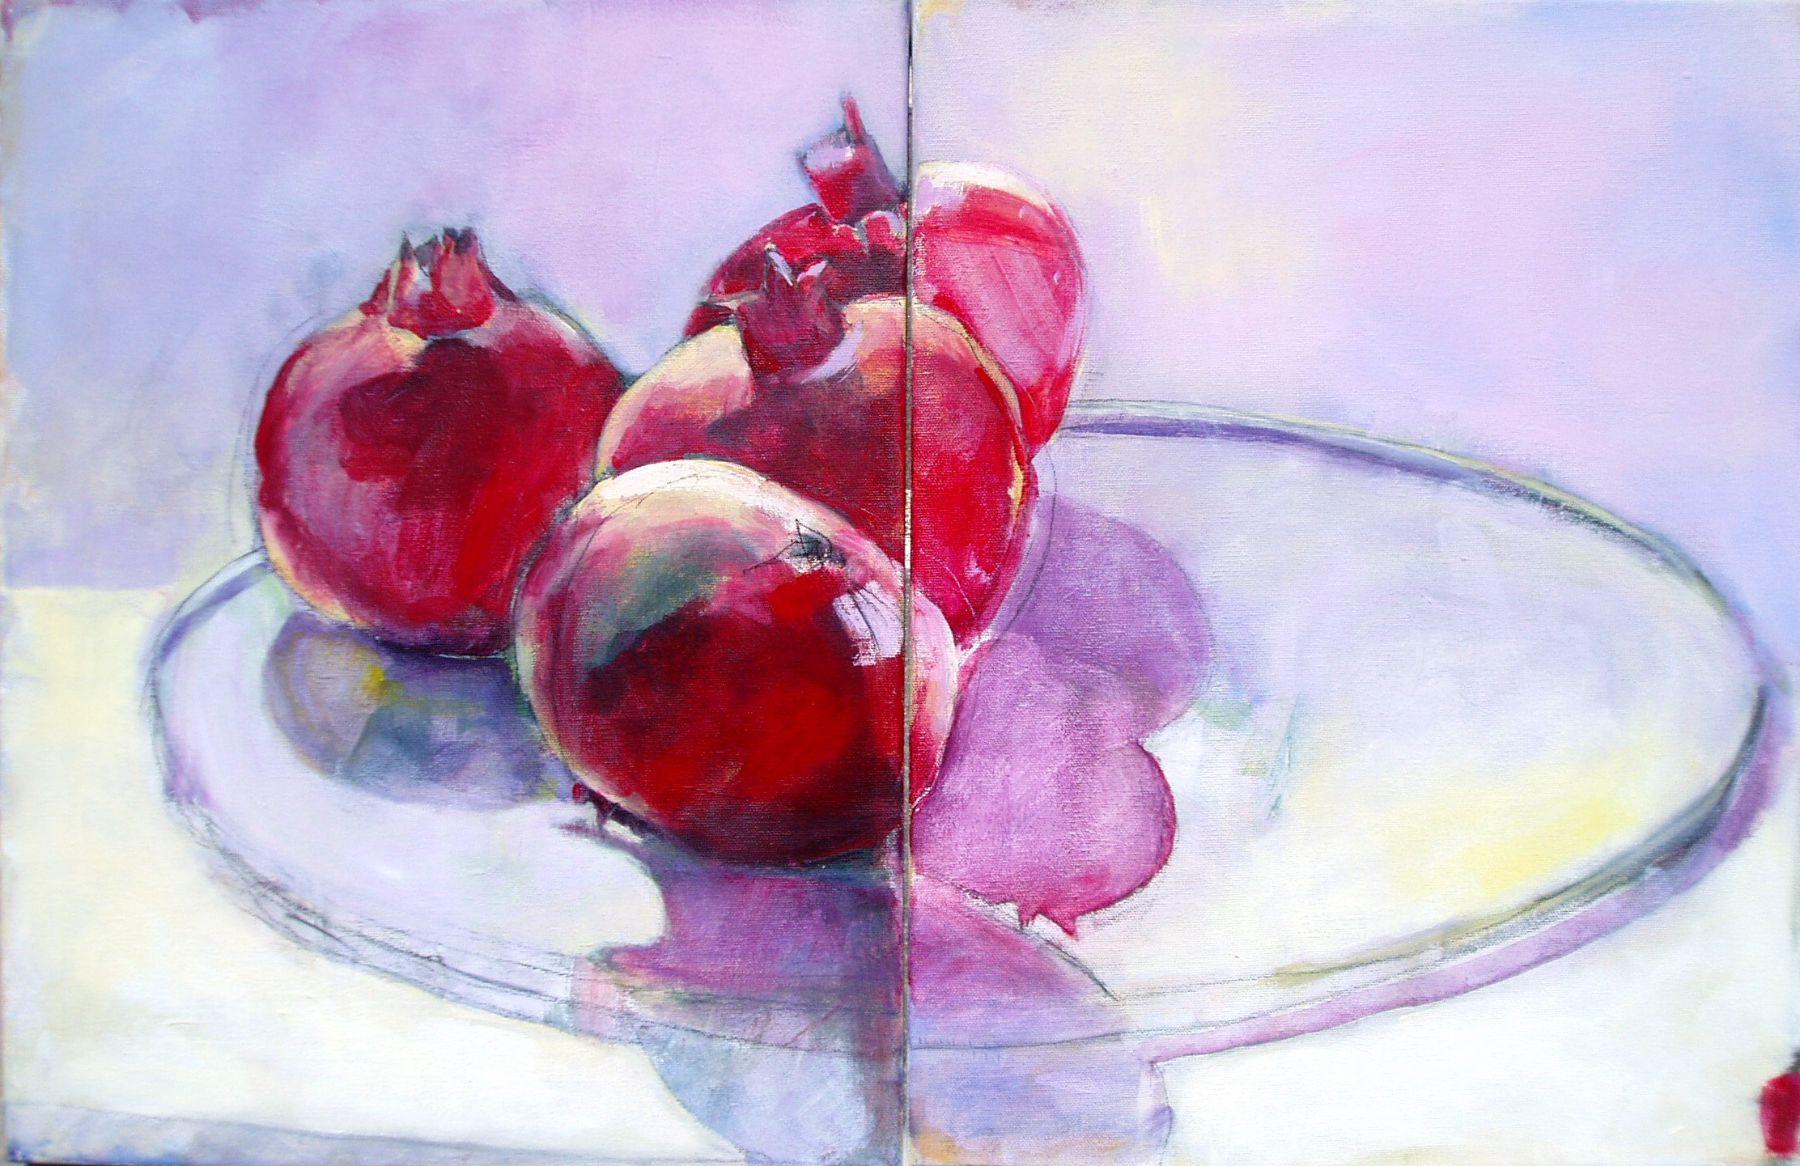 Pomegranates On A Plate - painting, acrylic on canvas by artist Neva Bergemann